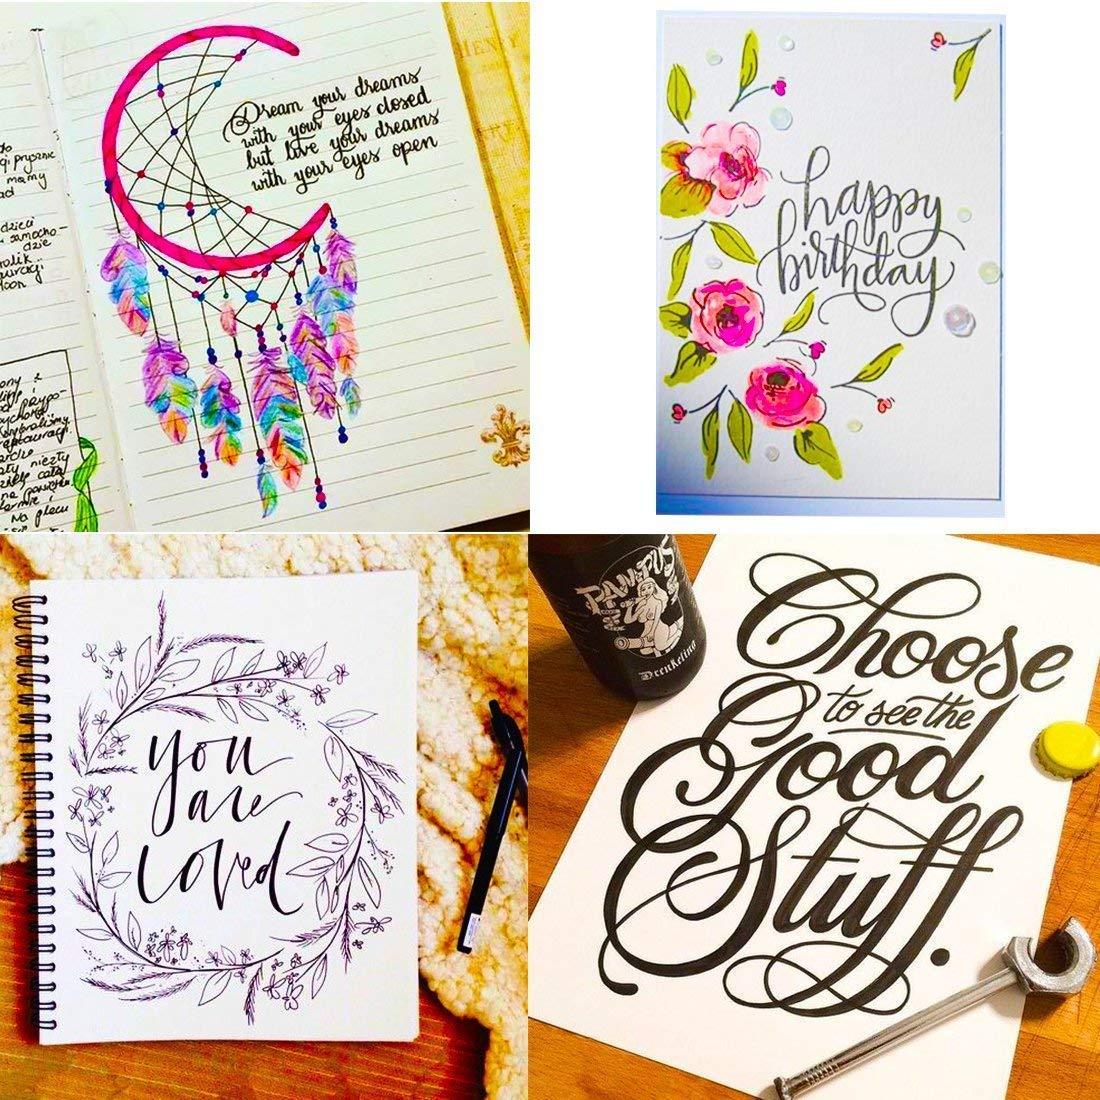 Refillable Hand Lettering Pen Brush Pens Markers for Calligraphy Beginners Signature Writing Art Drawing Illustration 4 Sizes Black Ink Pens Art Marker Set Design